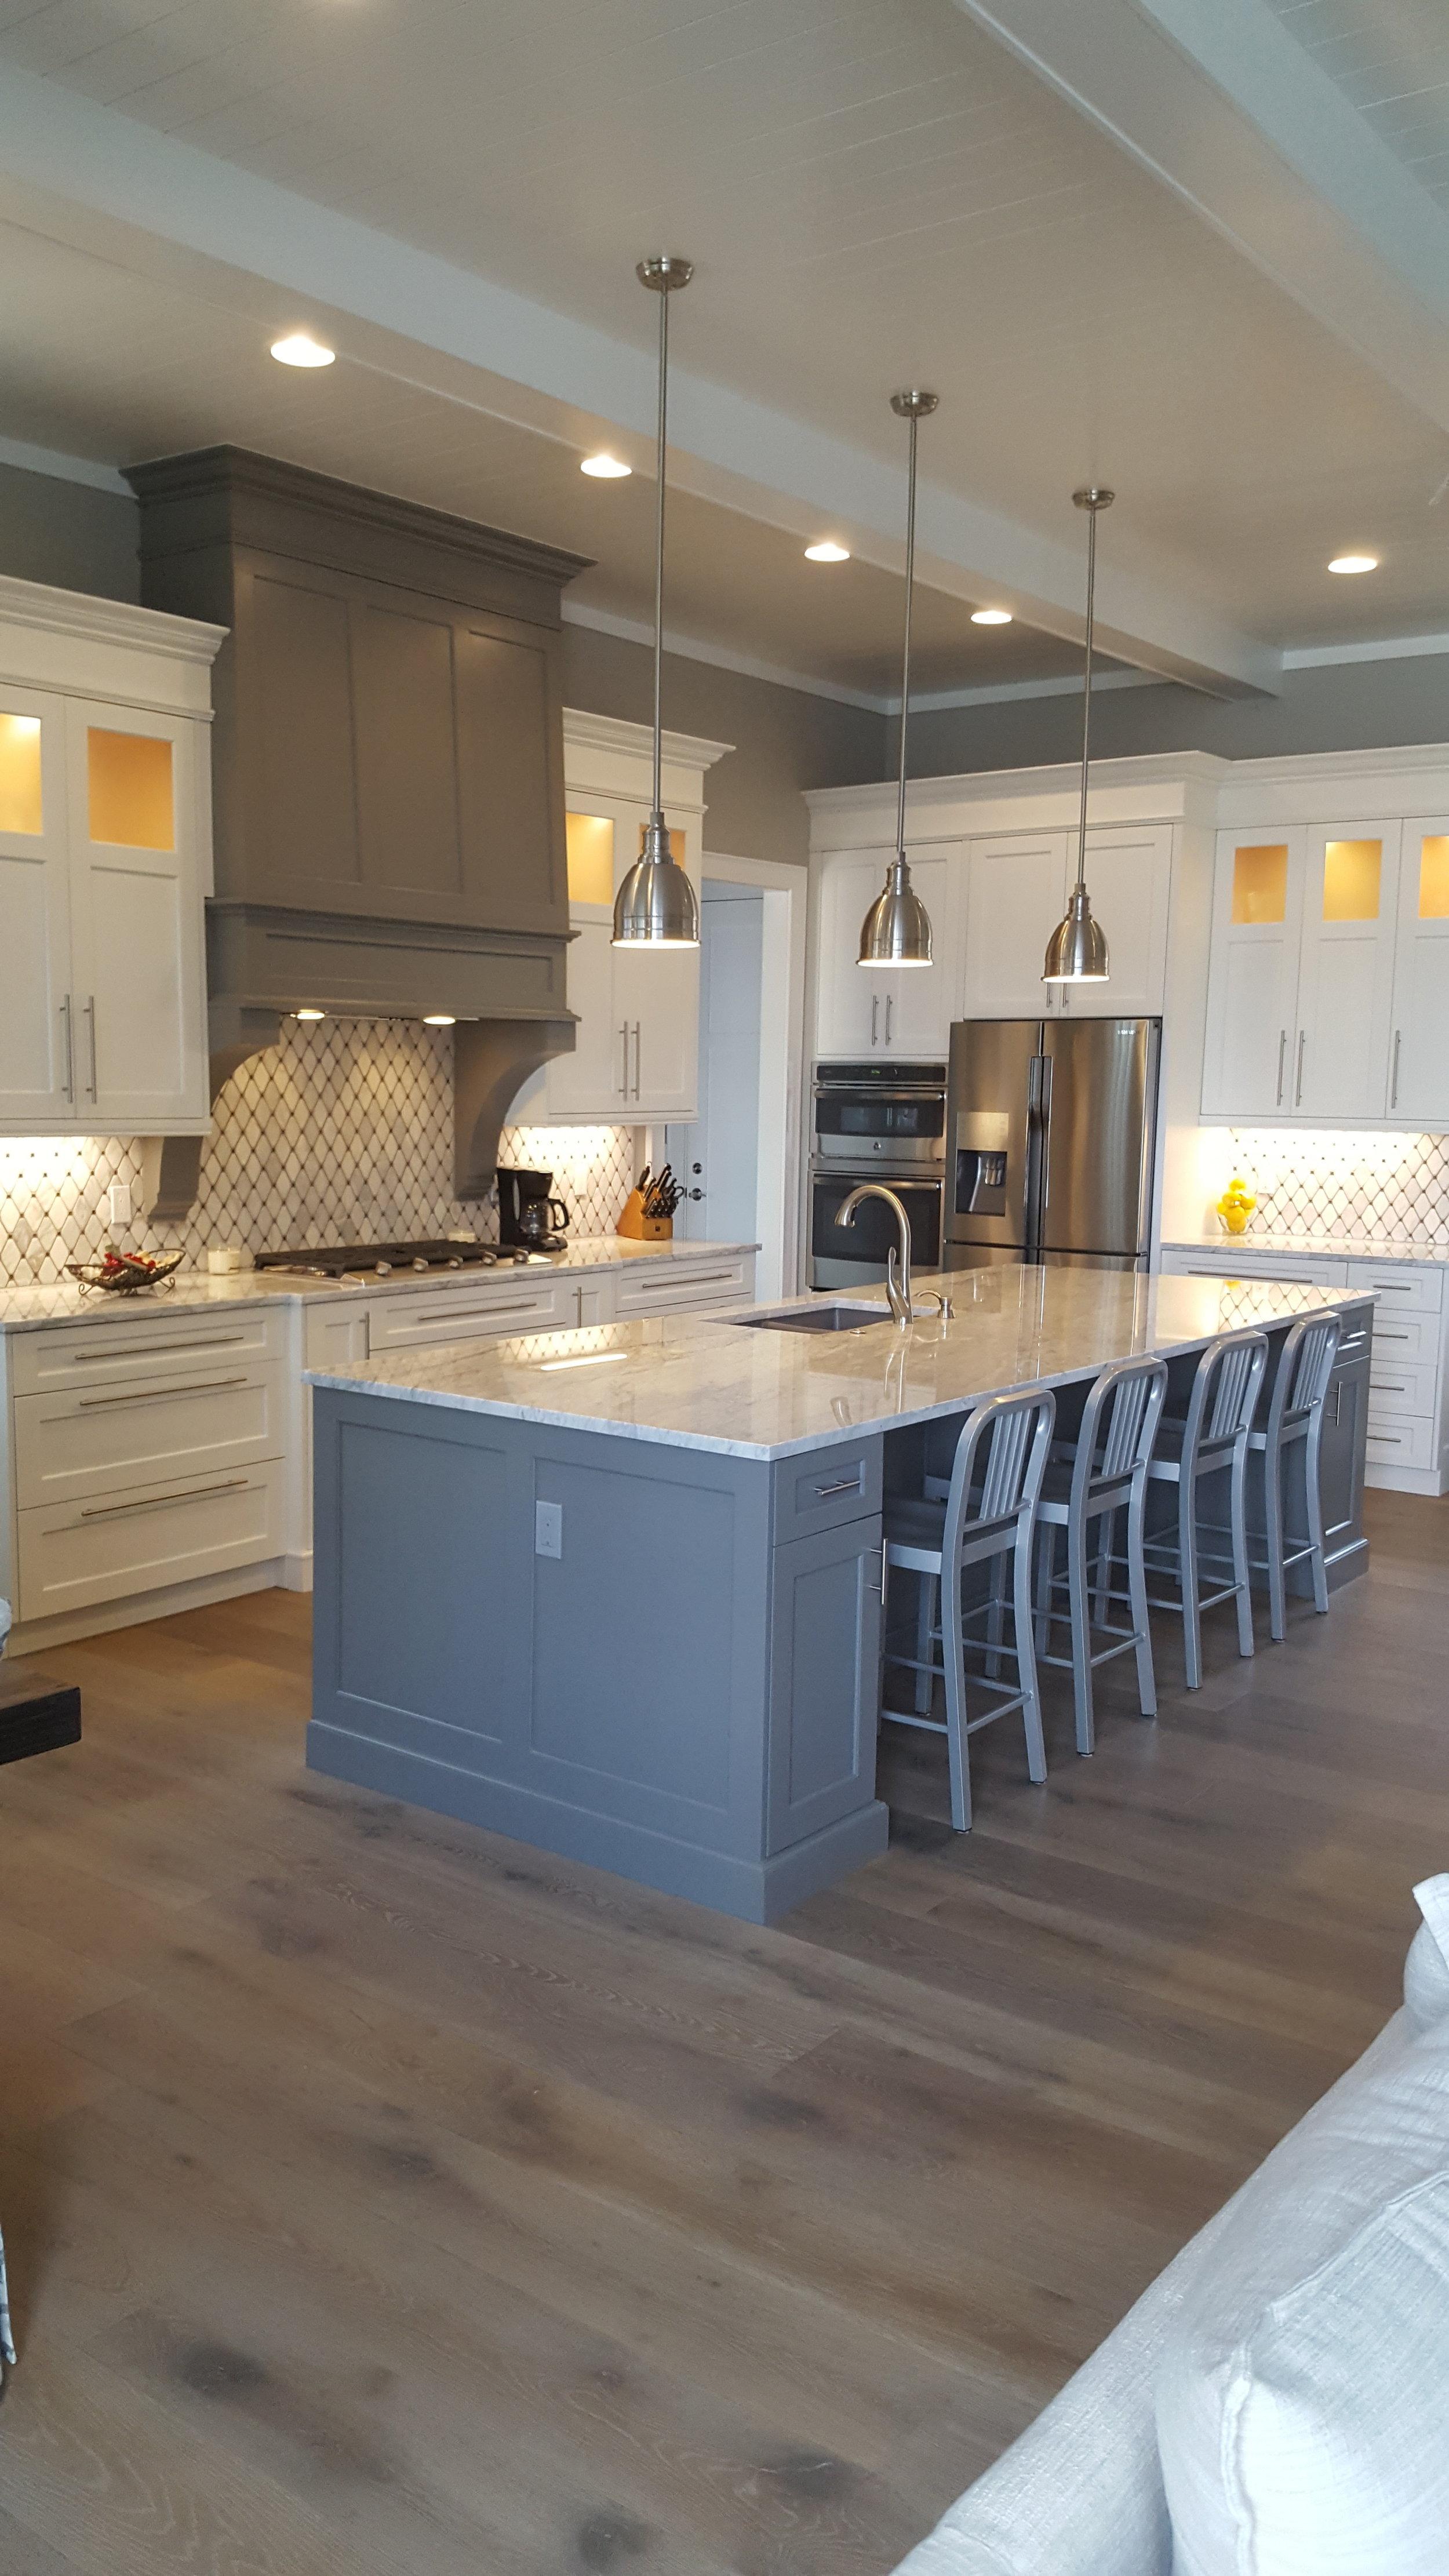 Kitchen 1 - Mary Stark.jpg